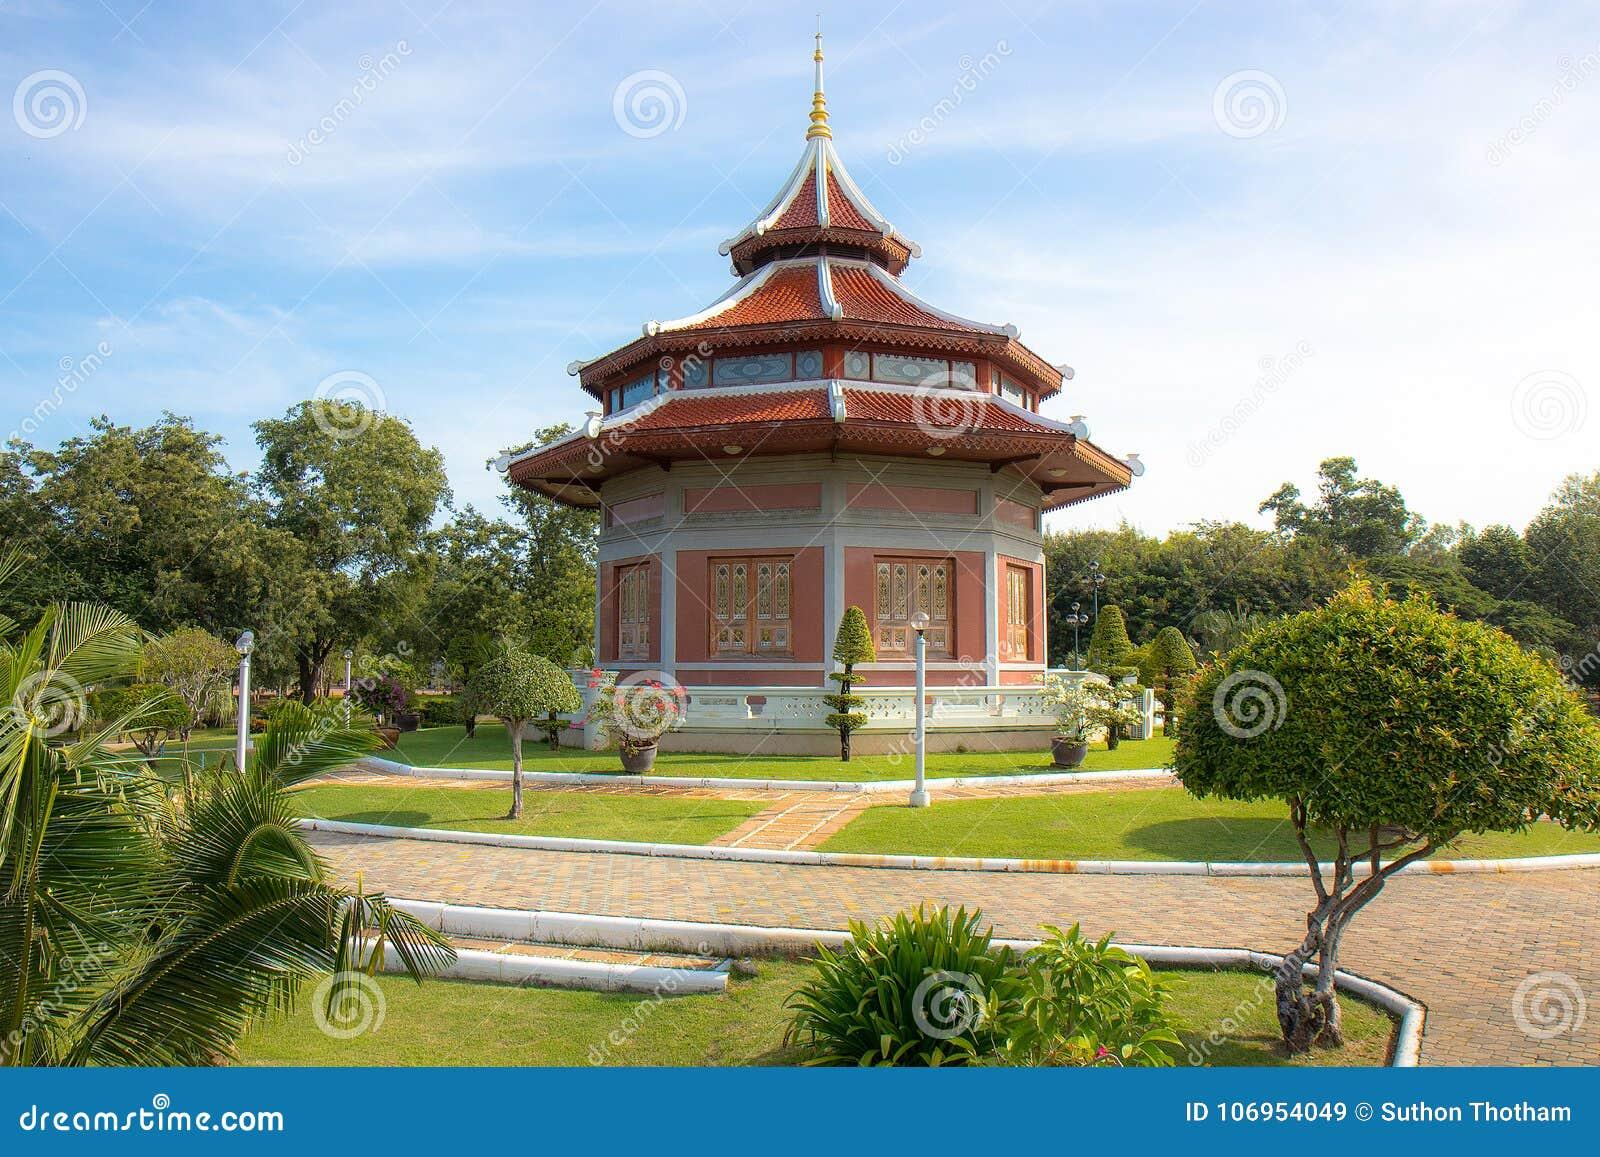 The Pagoda and Buddha Status at Wat Yai Chaimongkol, Ayutthaya,